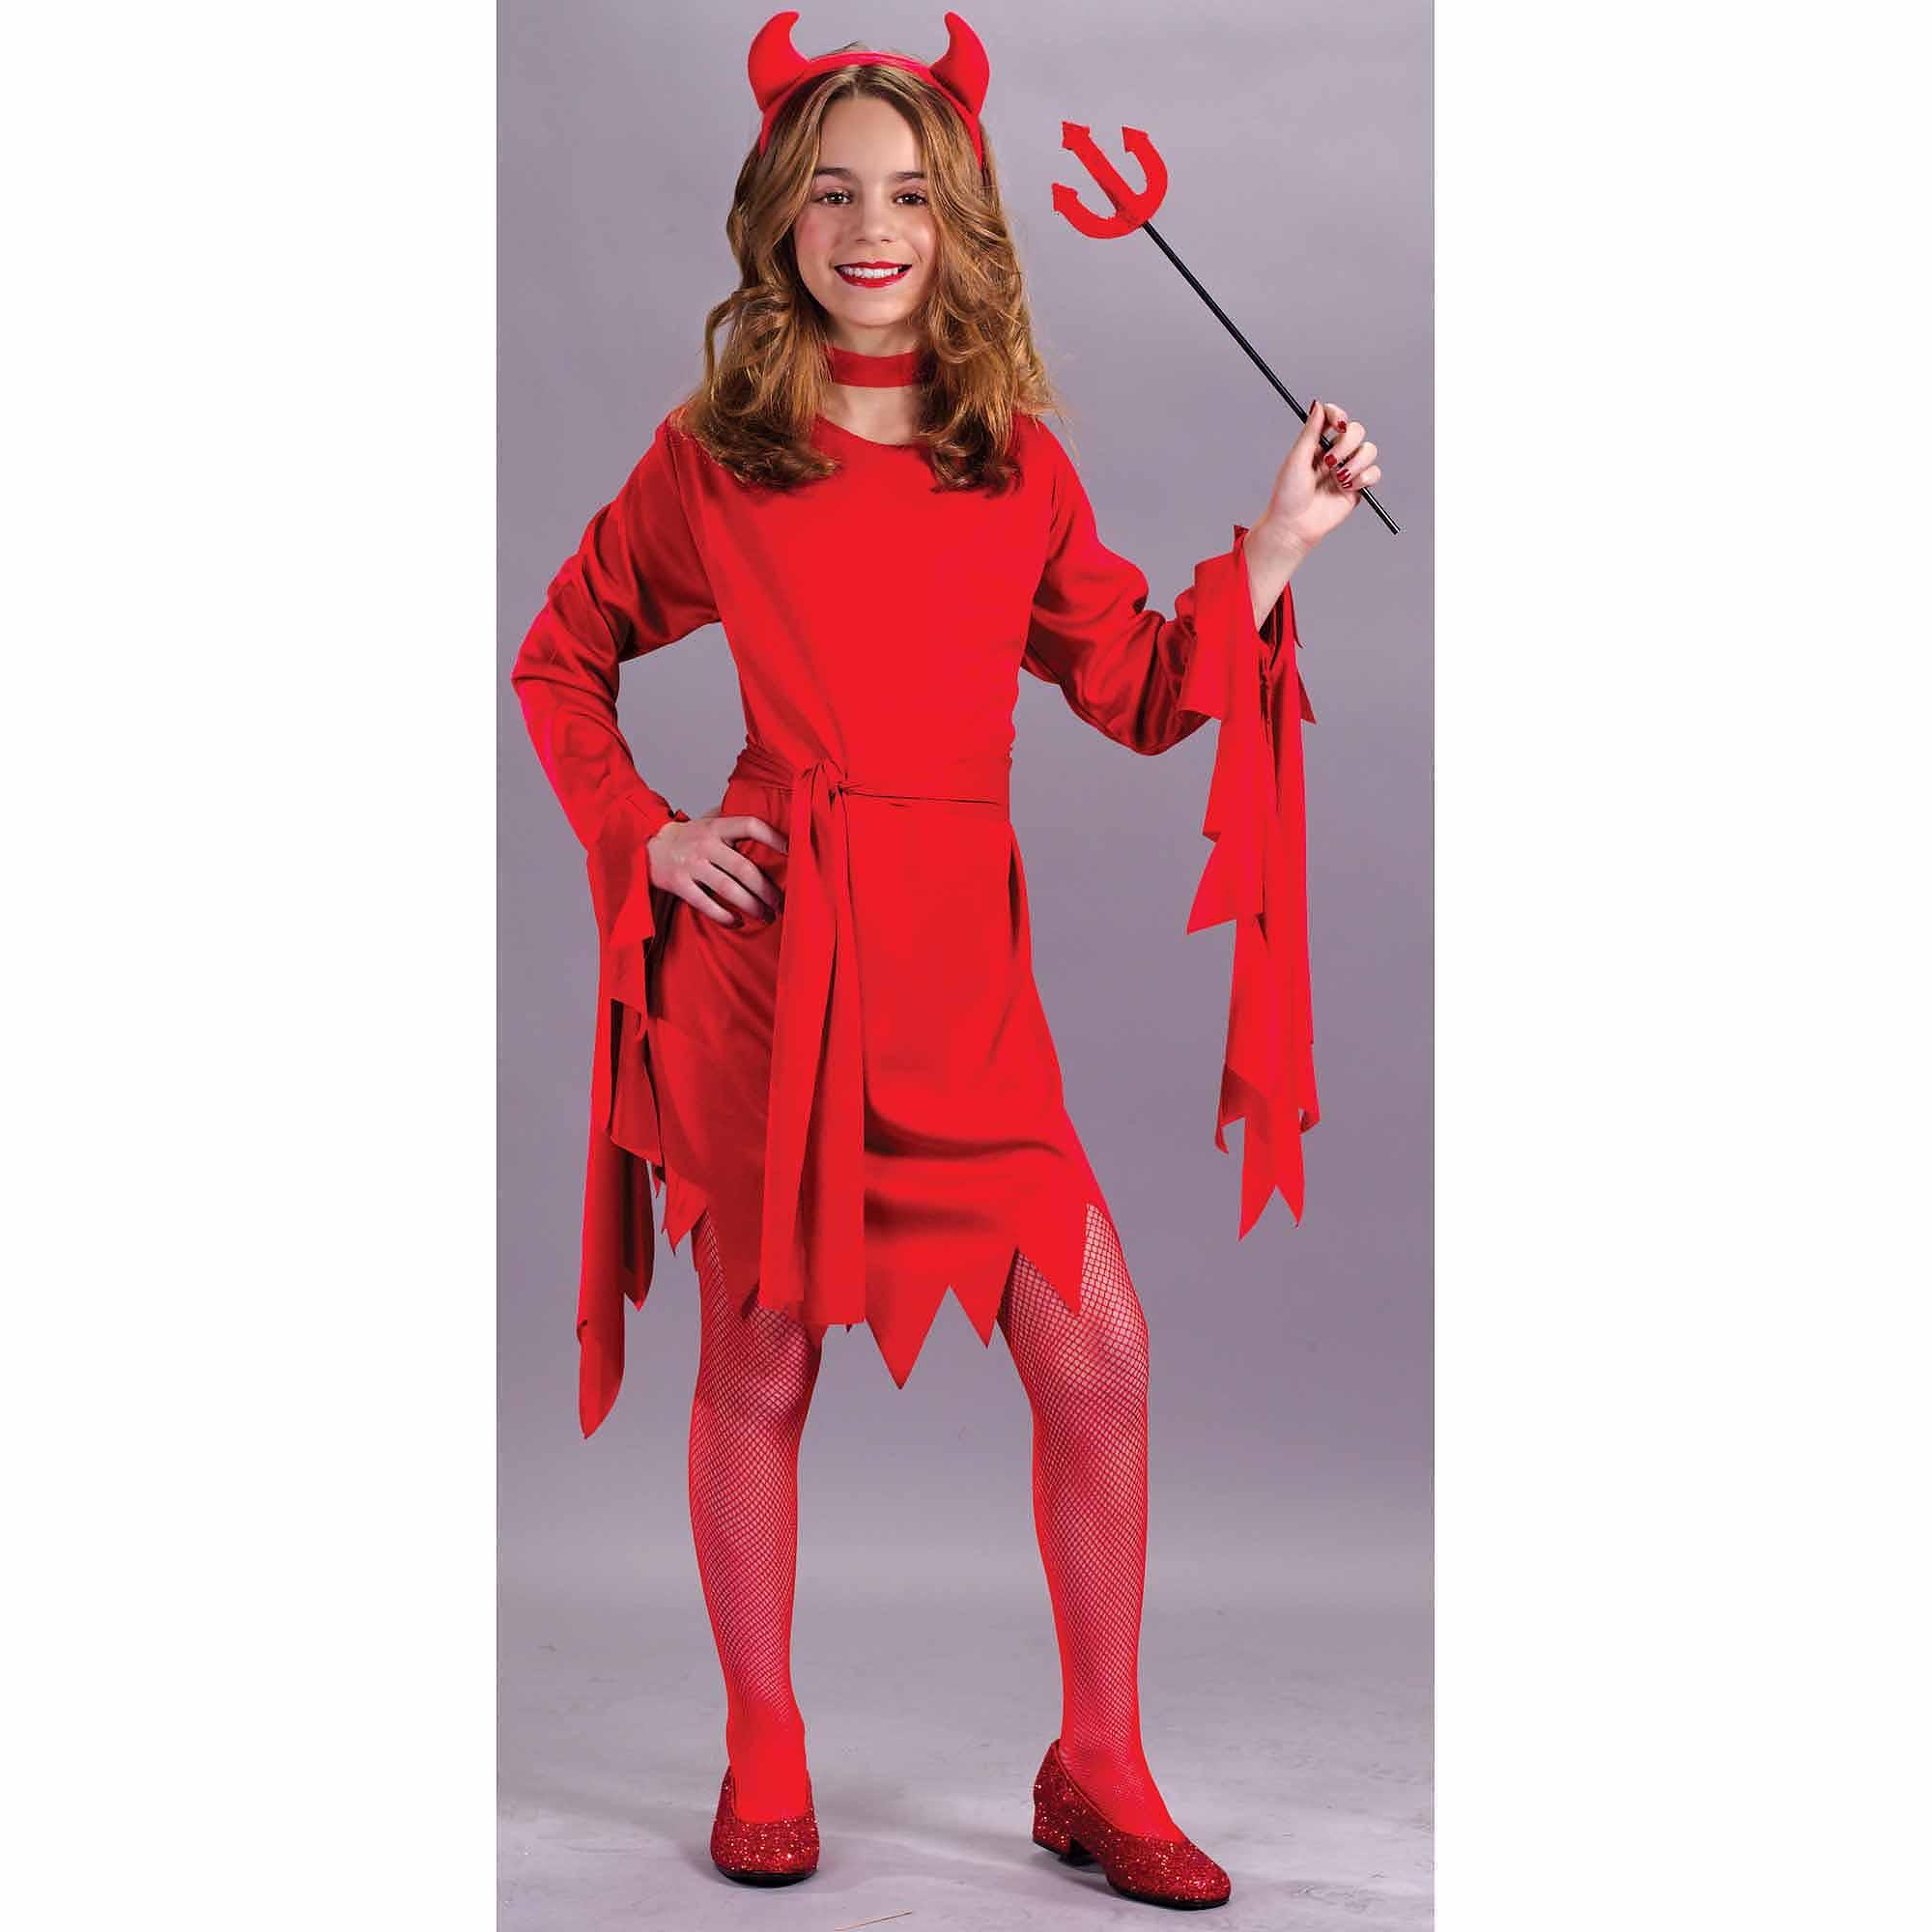 Kids devil halloween costumes pity, that